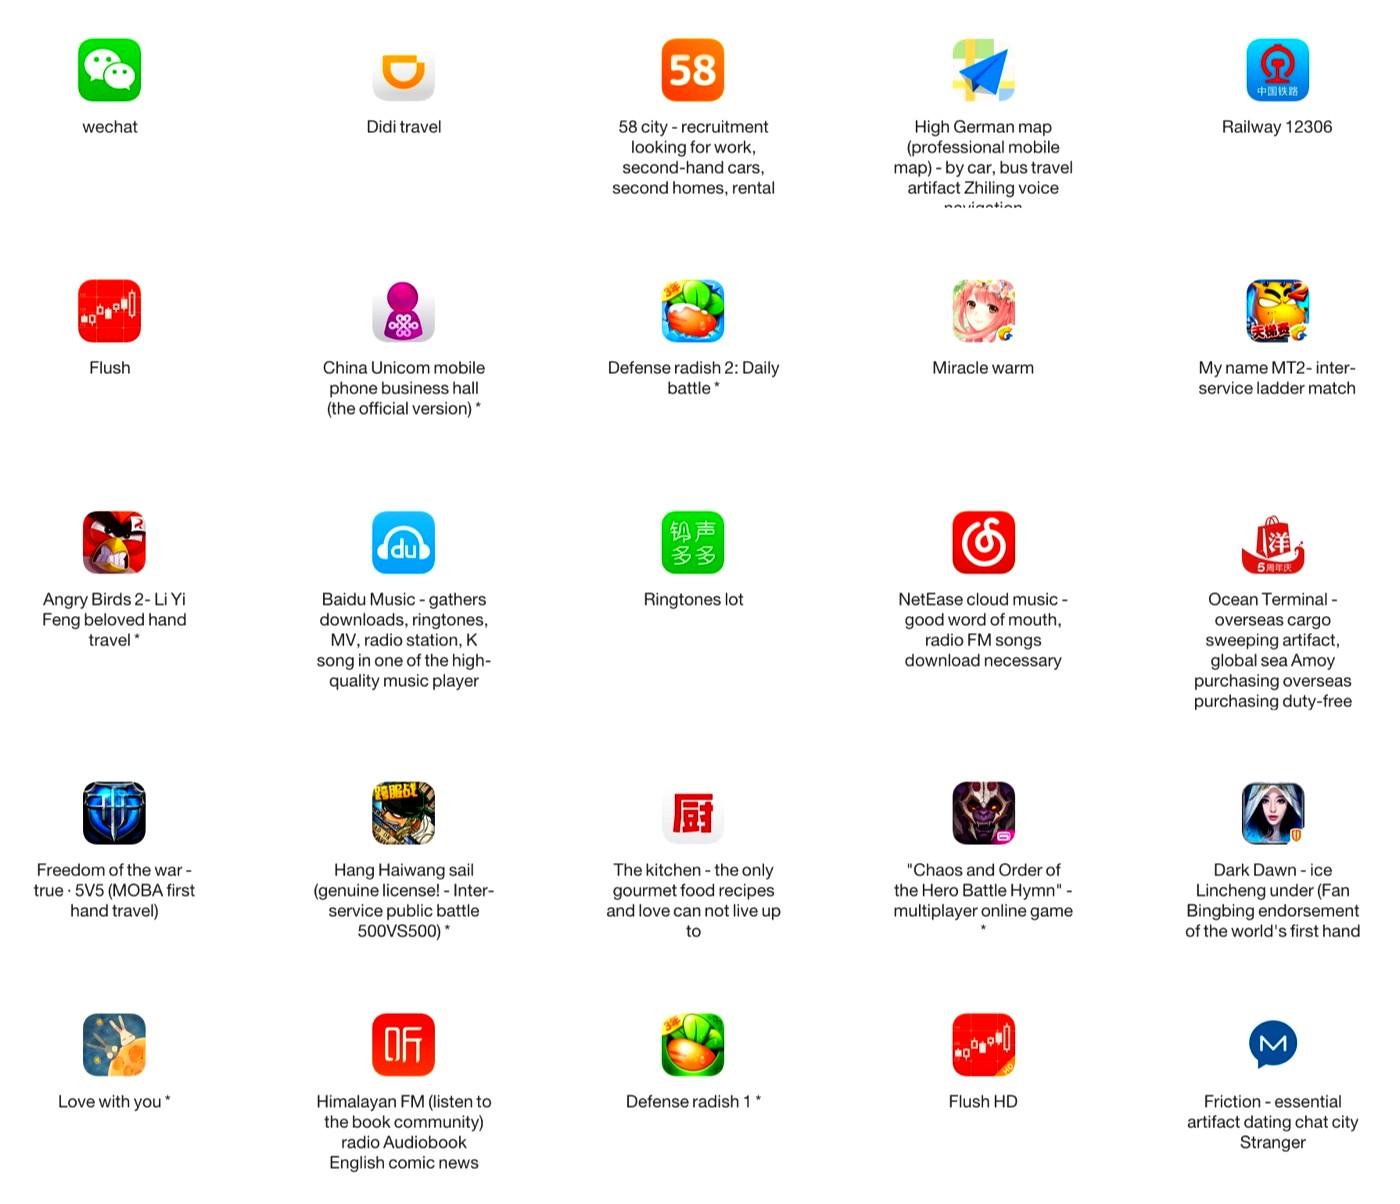 Apple-Xcodeghost-iapptweak